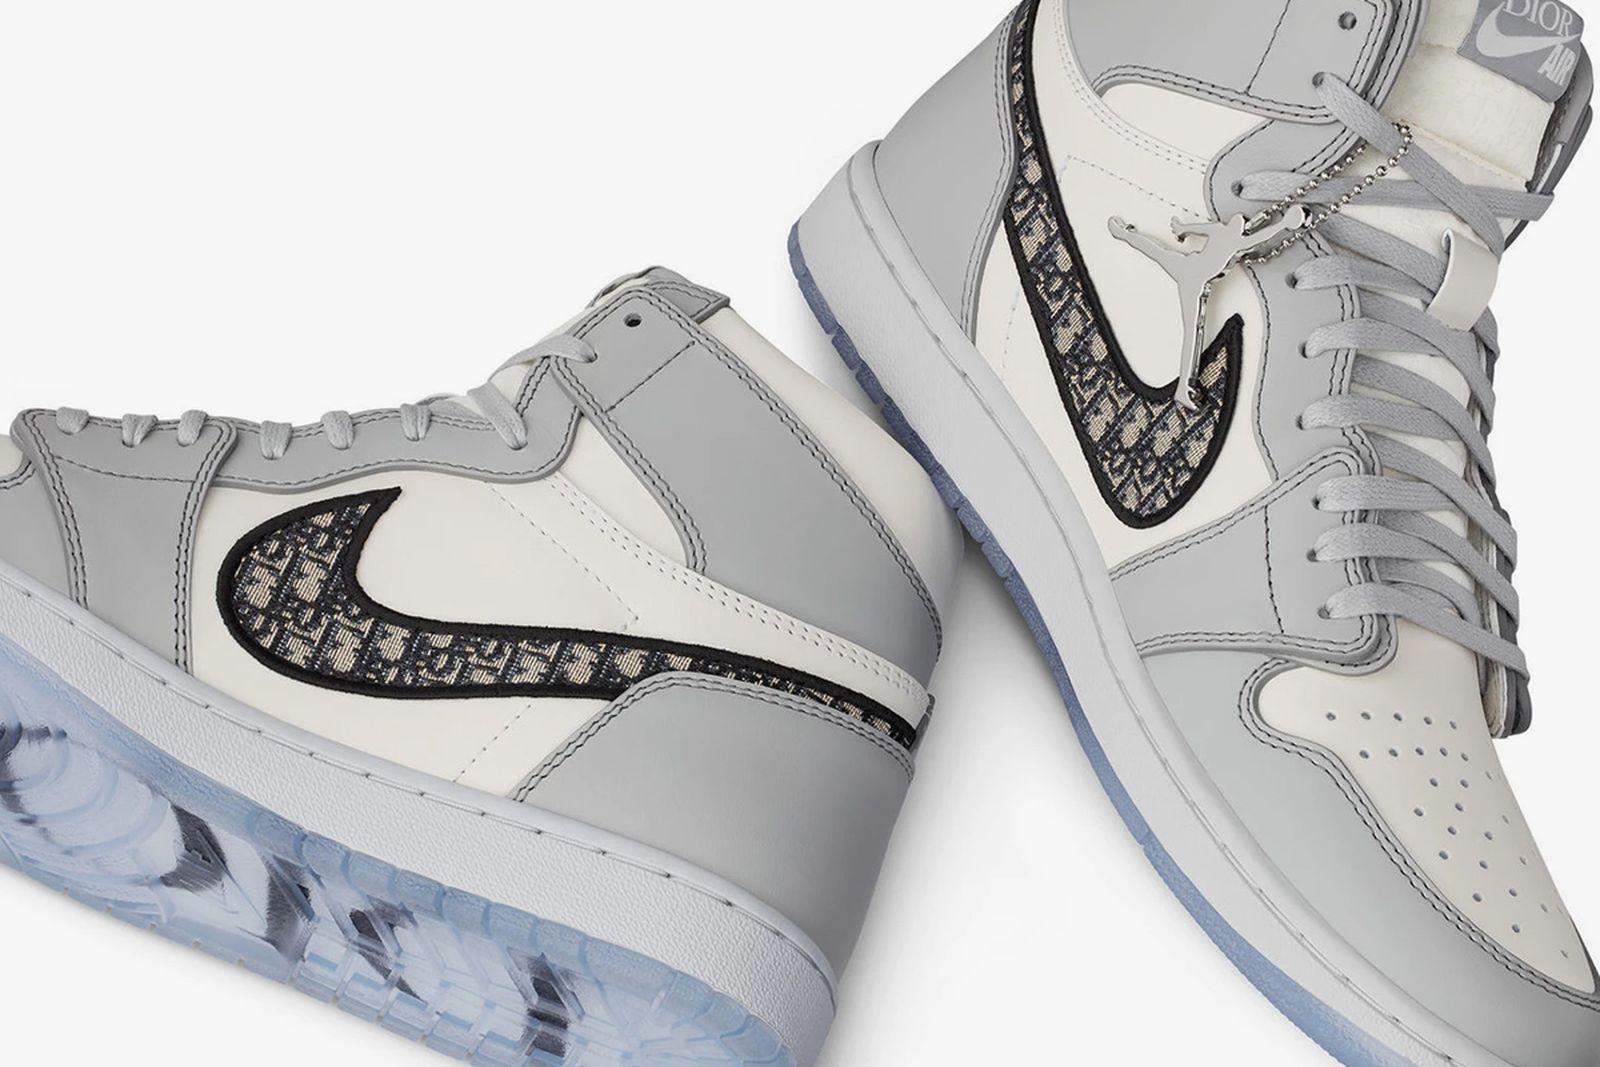 Salto tofu Comprimido  Dior x Nike Air Jordan 1: Official Release Information & Images